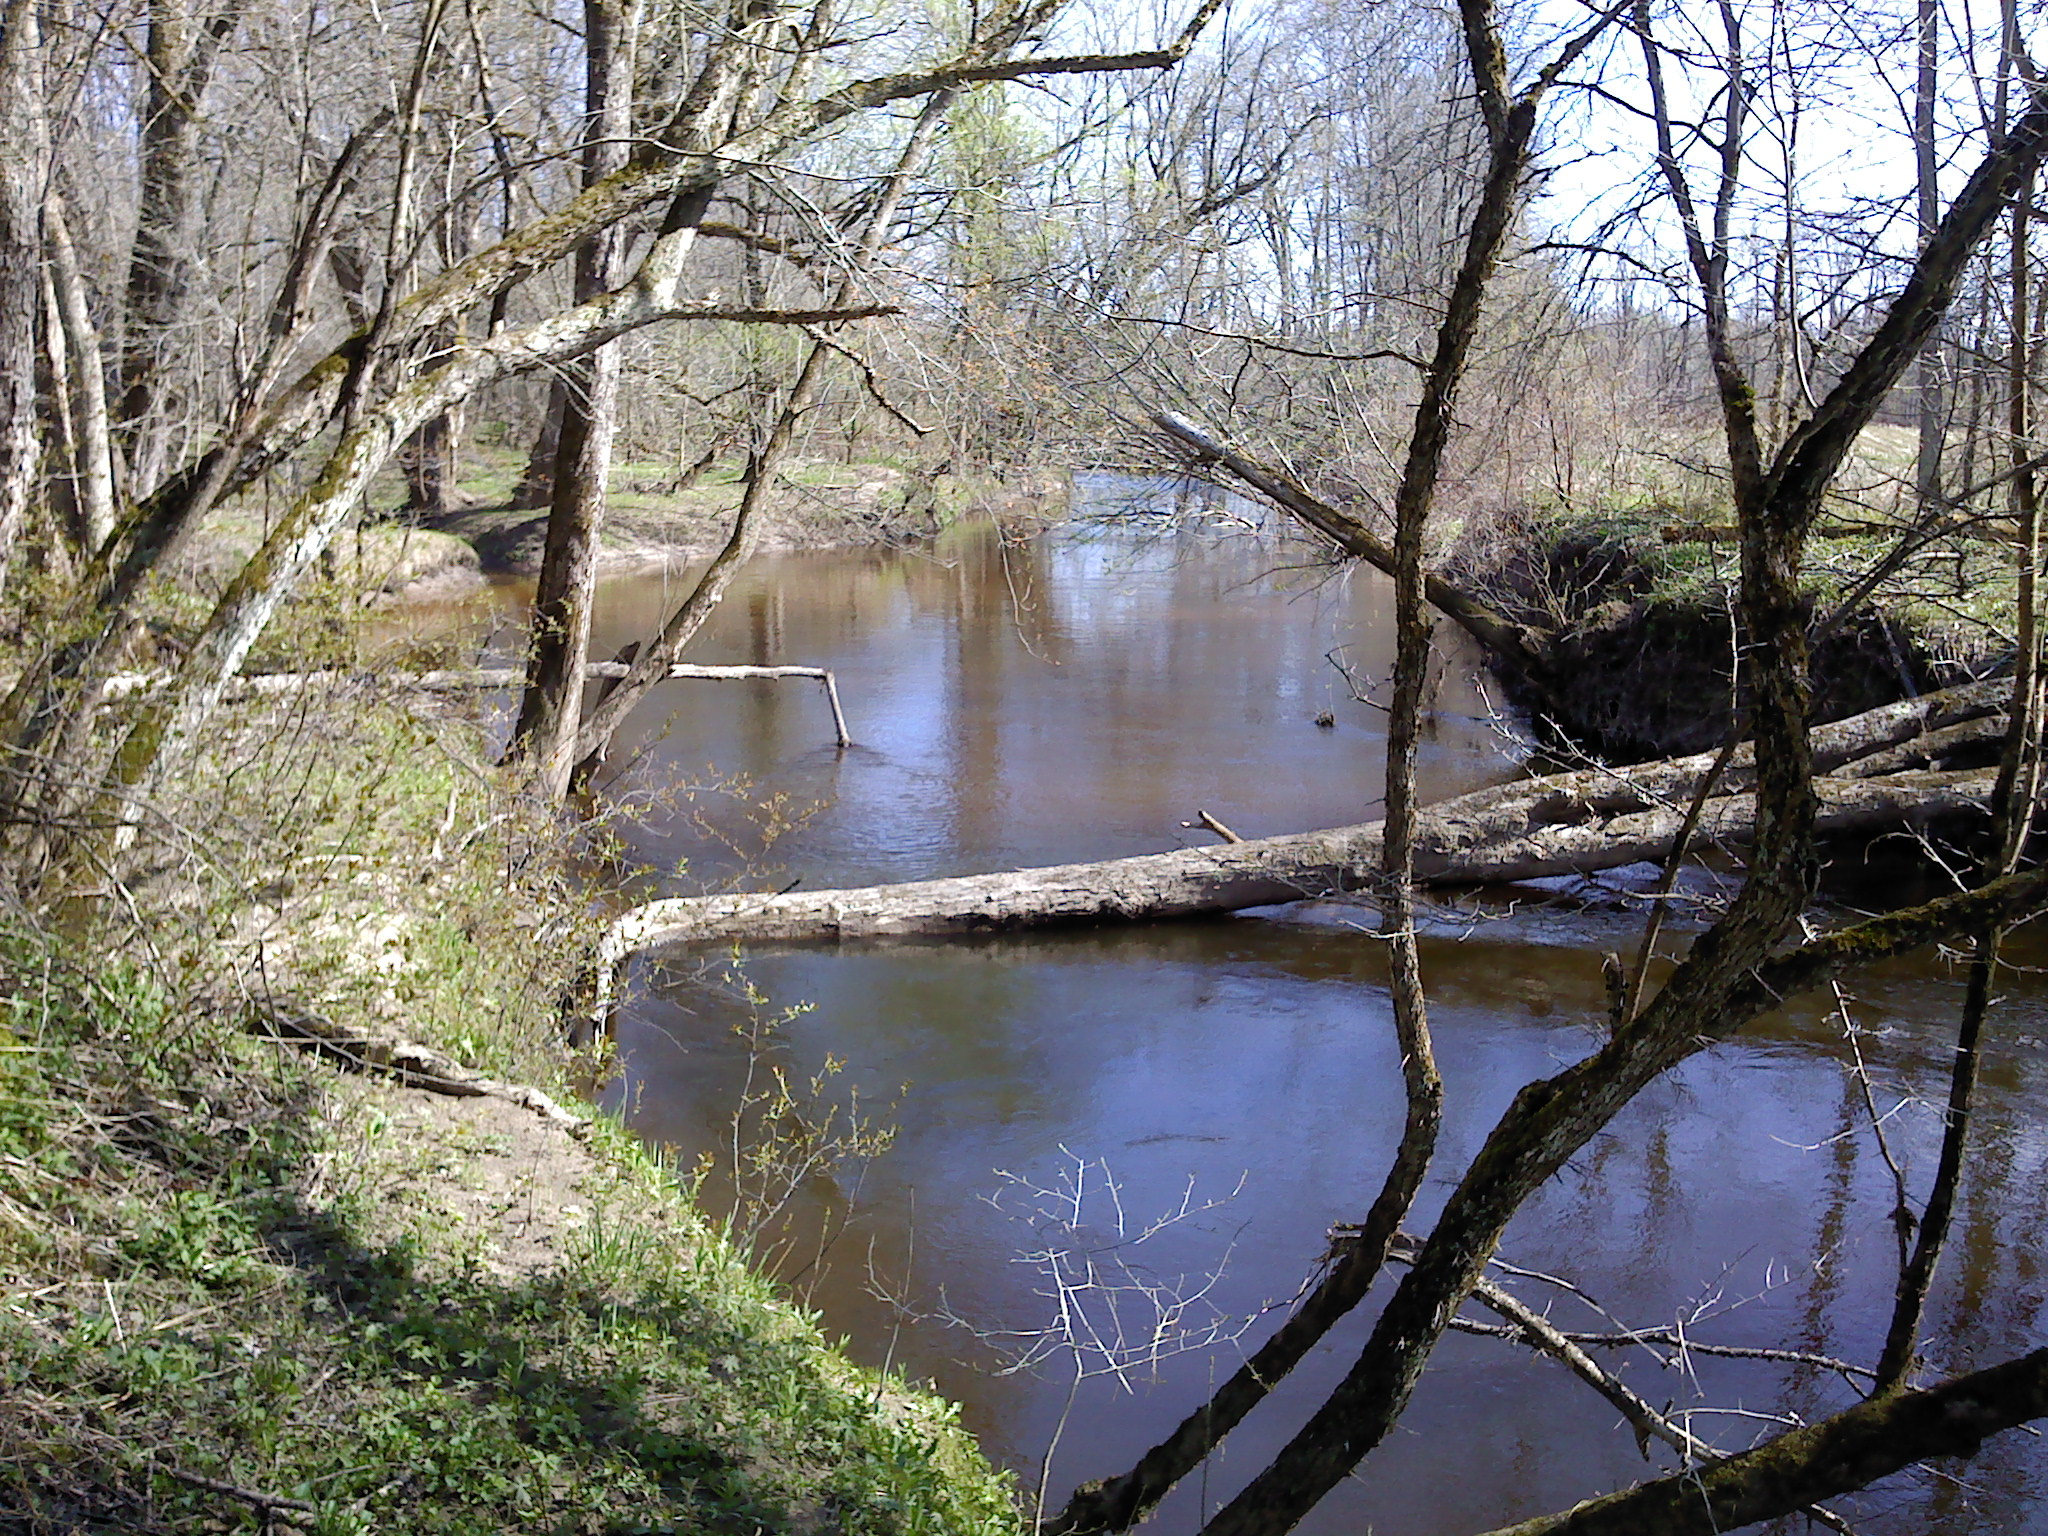 New york oneida county oriskany falls - Wood Newyork West Rome History Creek Canal Sand Woods Fort Dunes Colonial Bateaux Naturalhistory Revolution Mohawk